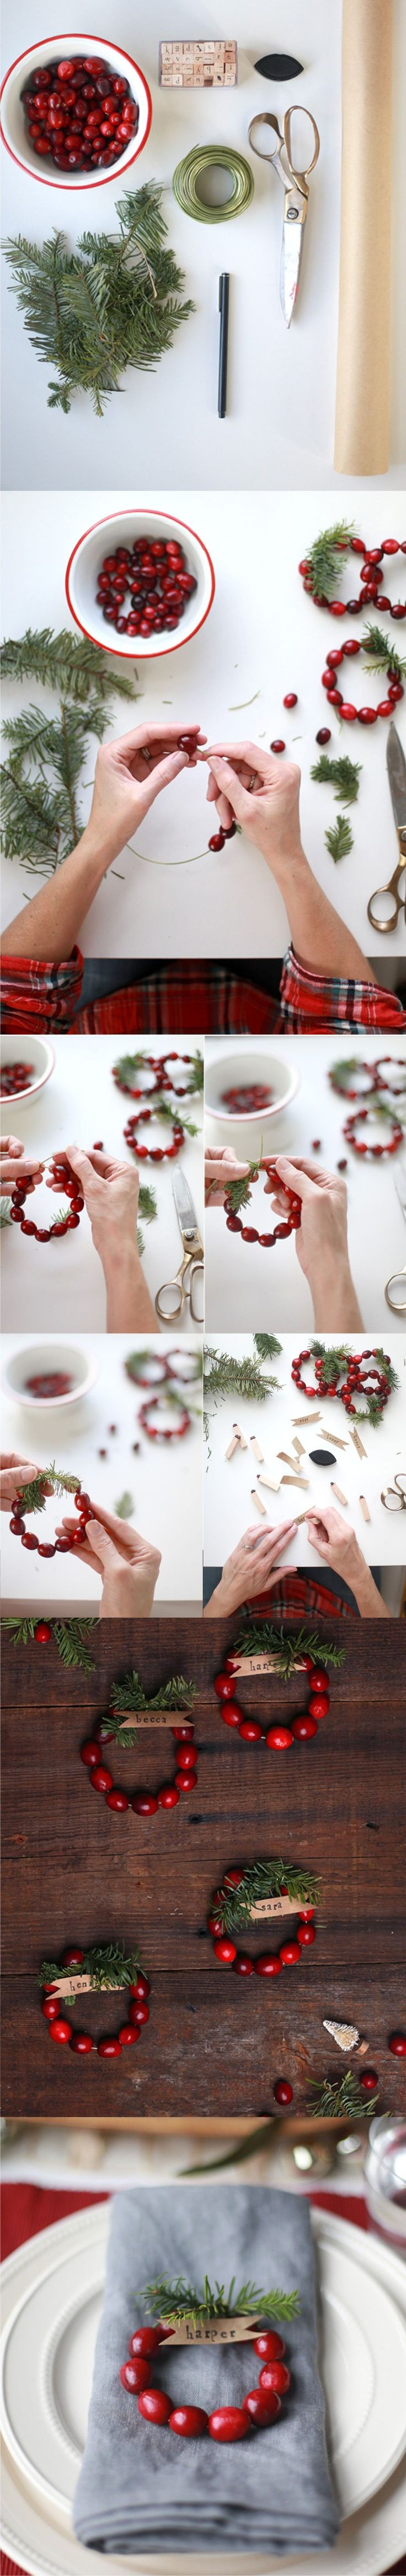 Decorar tu mesa en Navidad - sayyes.com - DIY mini Cranberry Wreath Place Cards